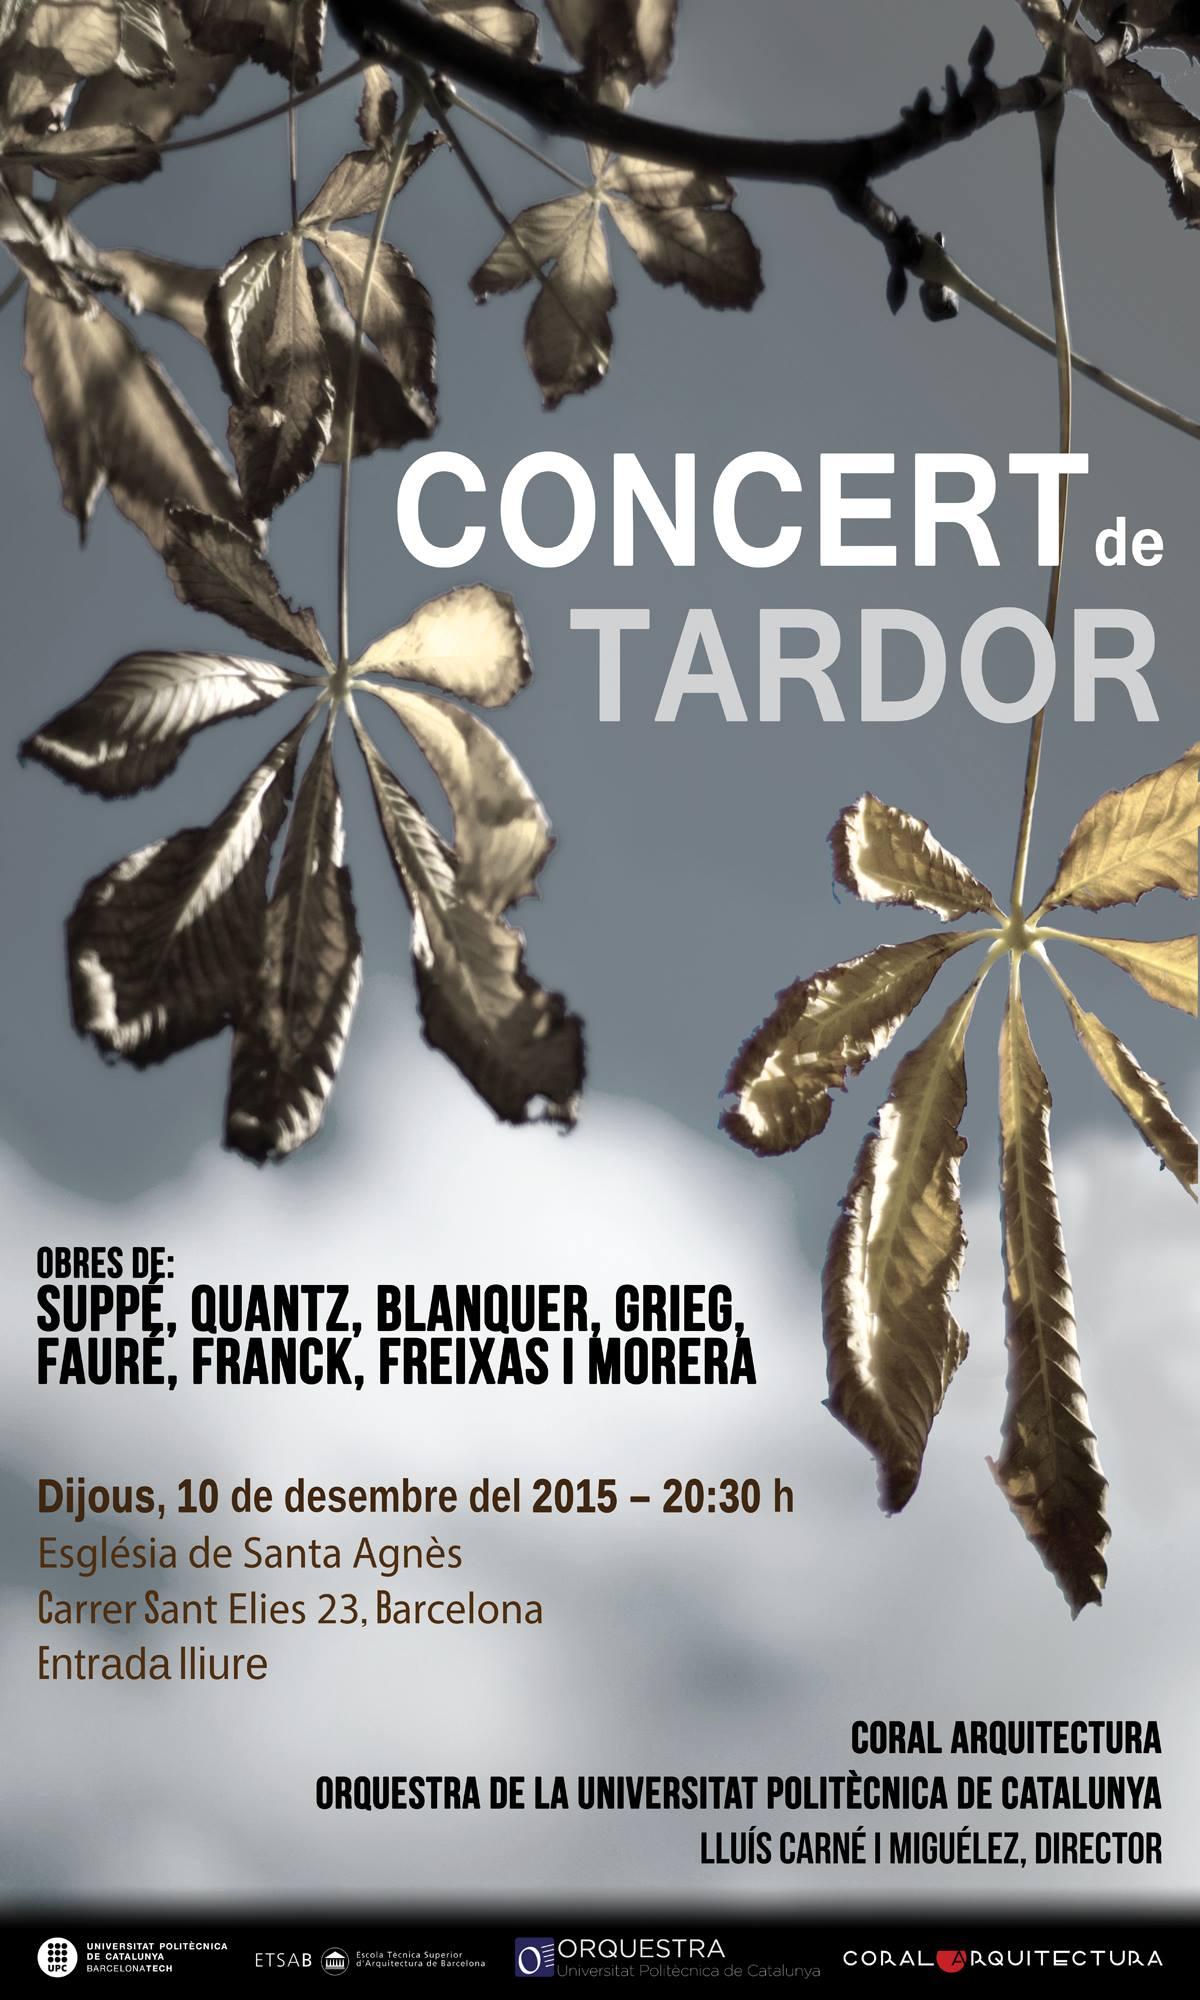 Segon concert de tardor 2015